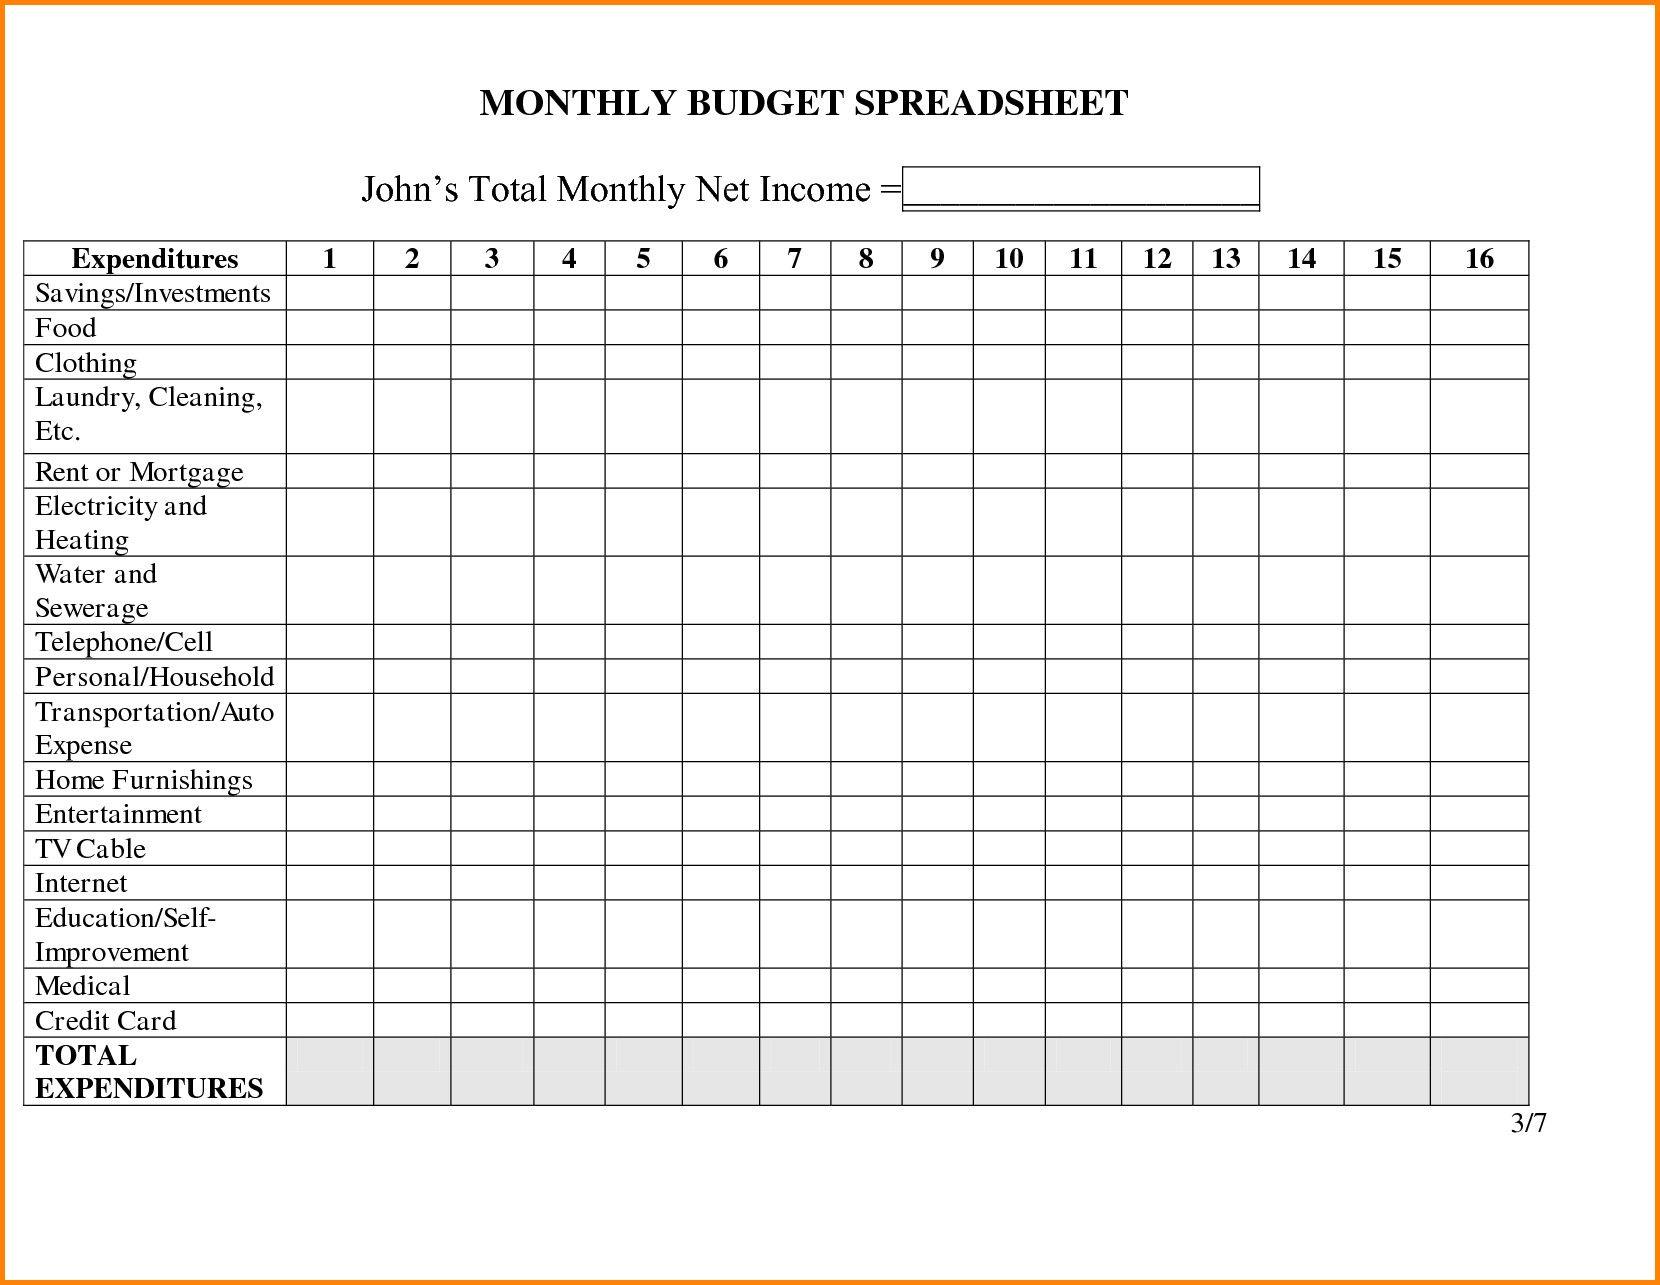 Periodicrecent Monthly Expenses Worksheet Monthlyexpensesdeutsch Monthlyexpensesfam Budget Spreadsheet Wedding Budget Spreadsheet Monthly Budget Spreadsheet [ 1285 x 1660 Pixel ]